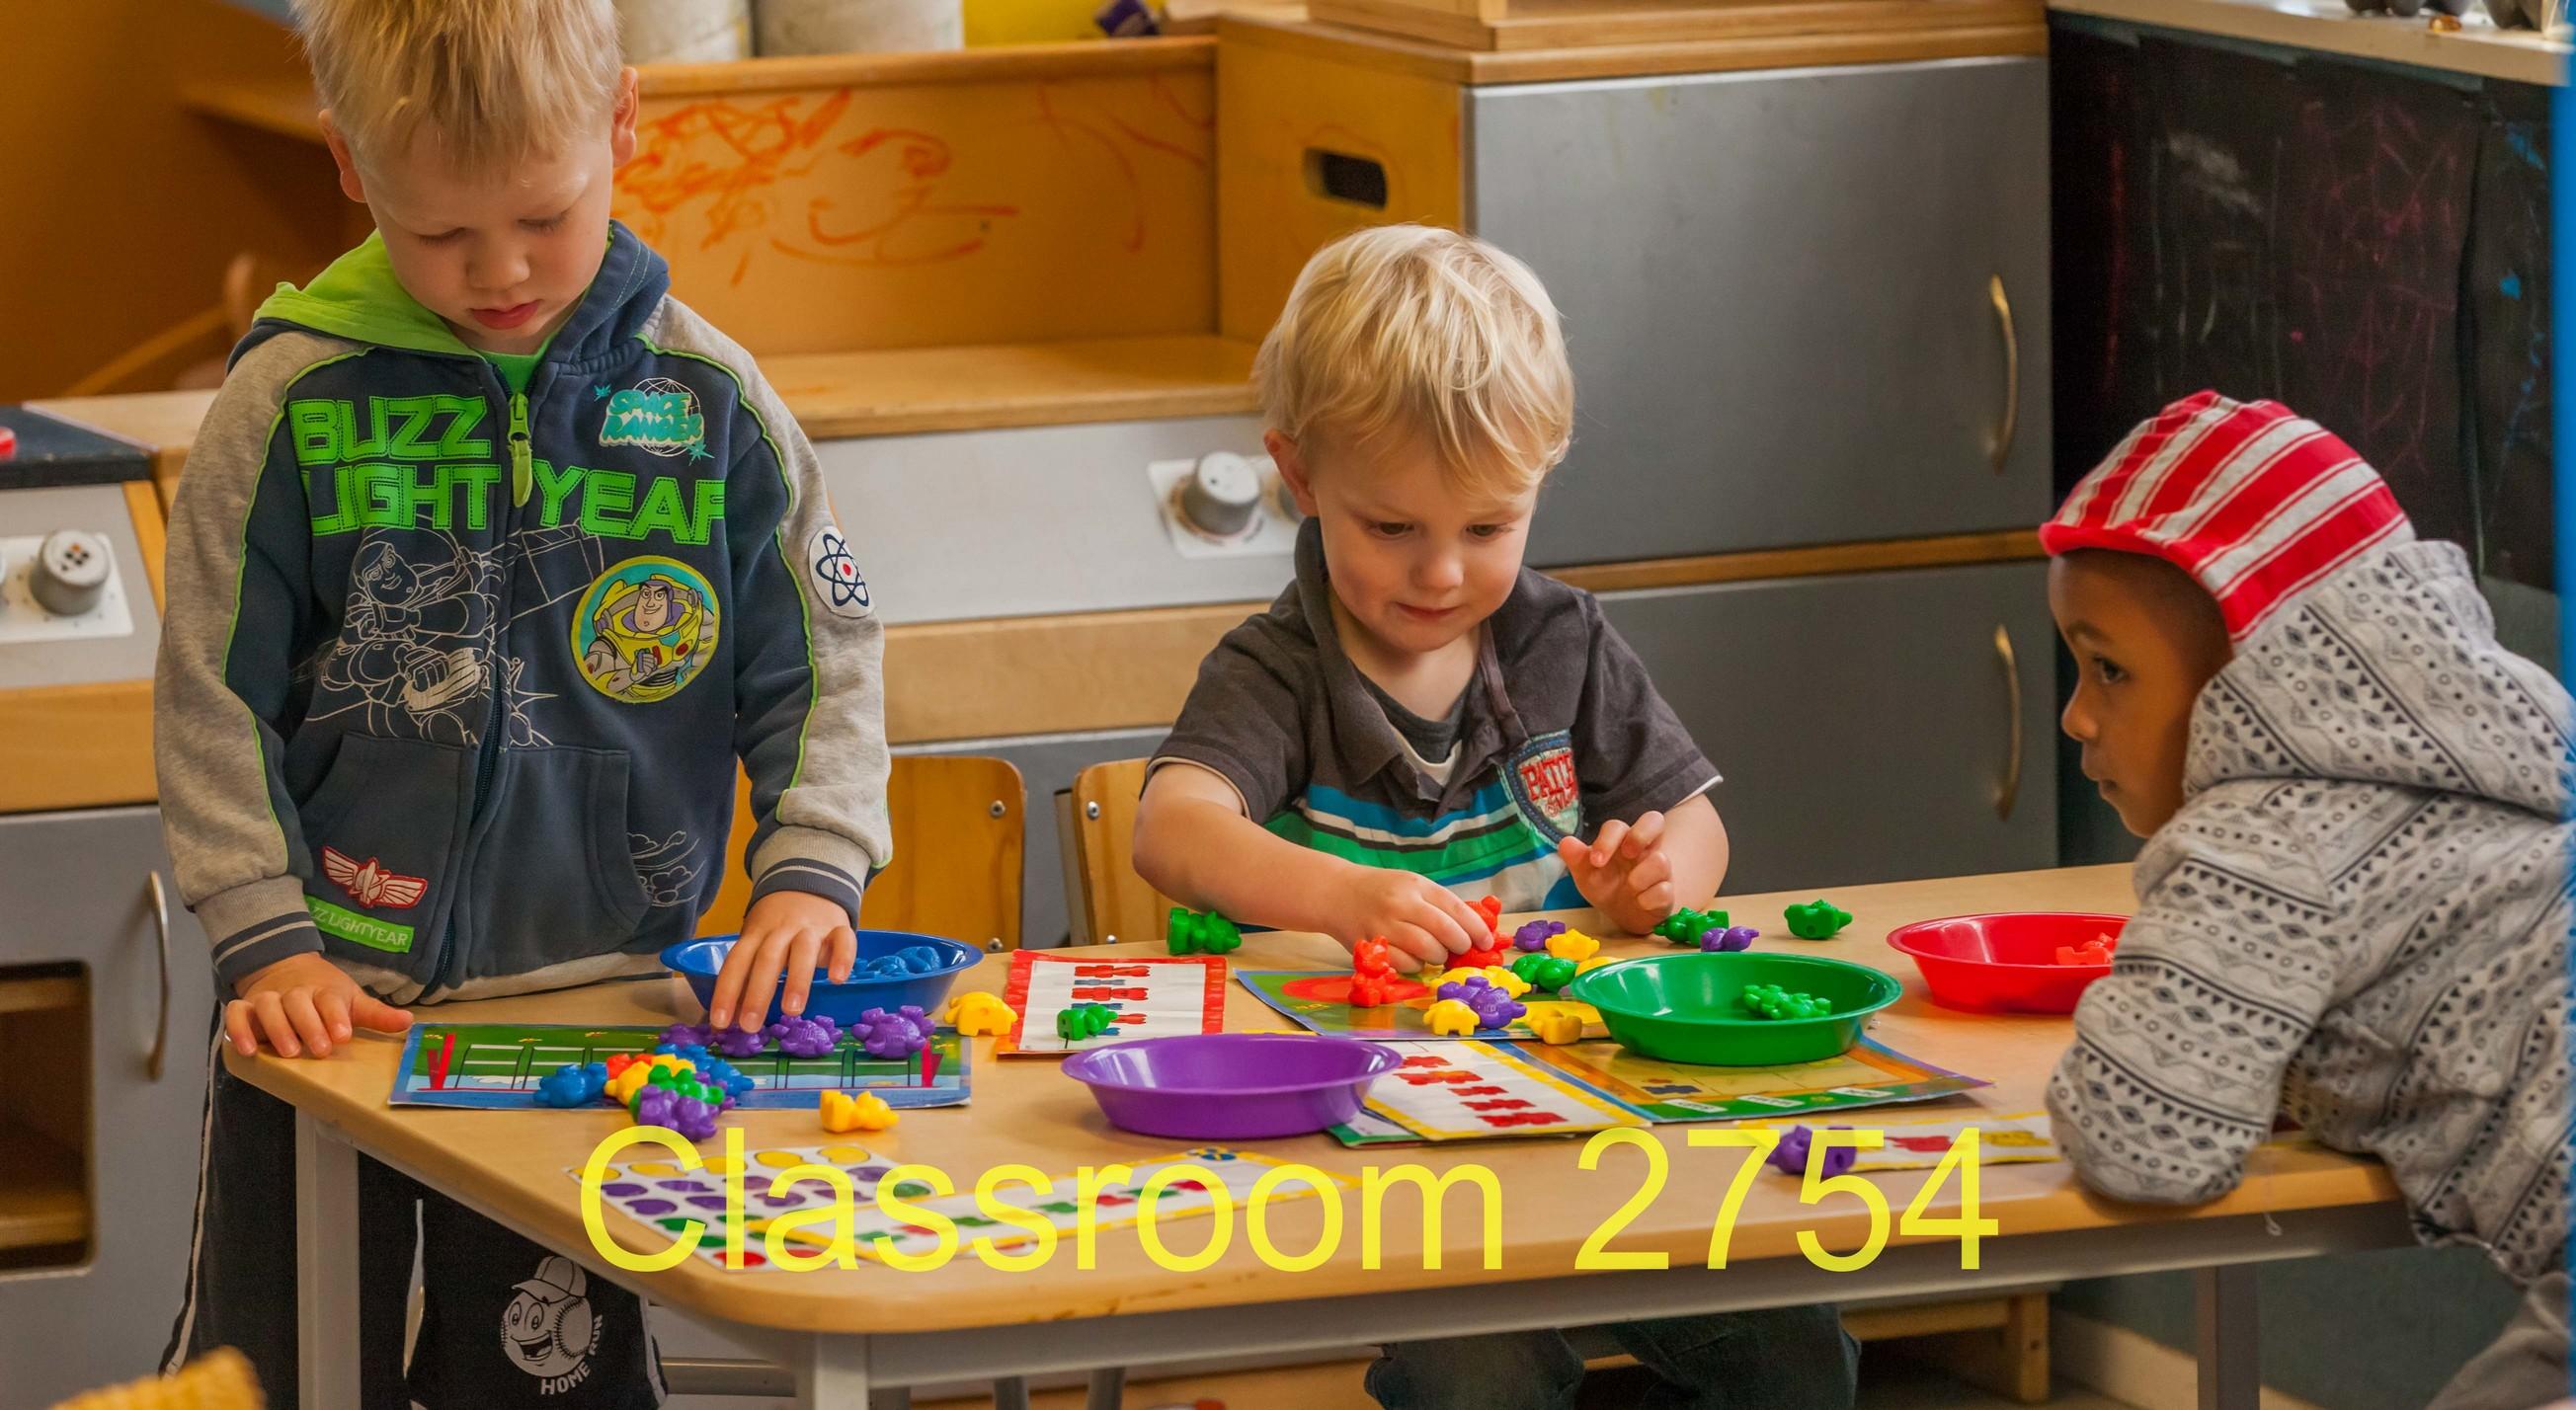 Classroom 2754